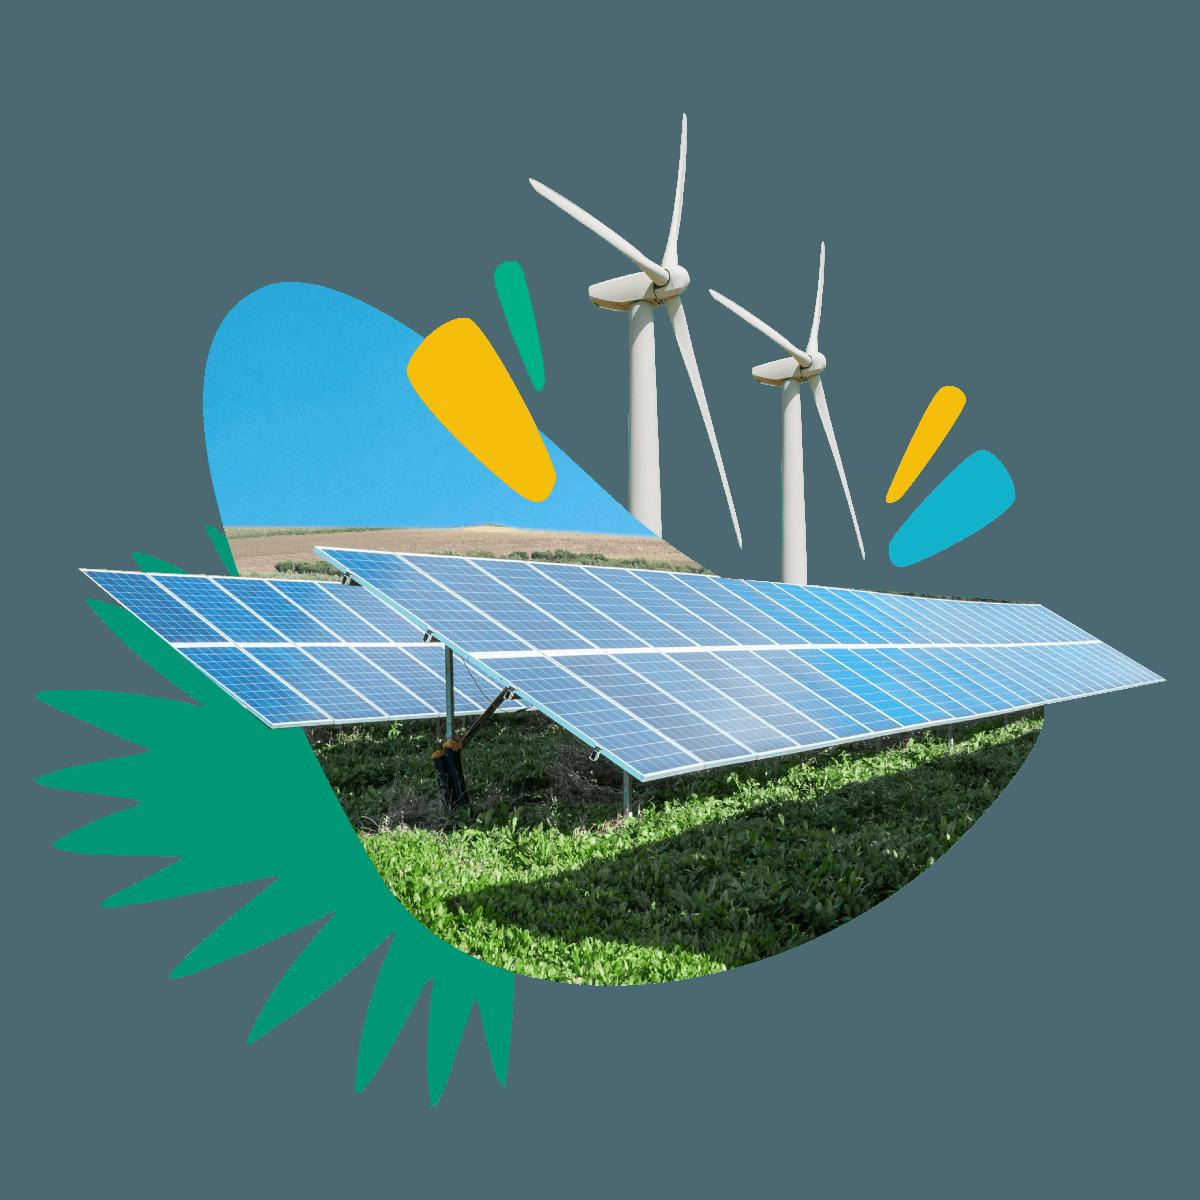 Illustration of solar farms & wind farms